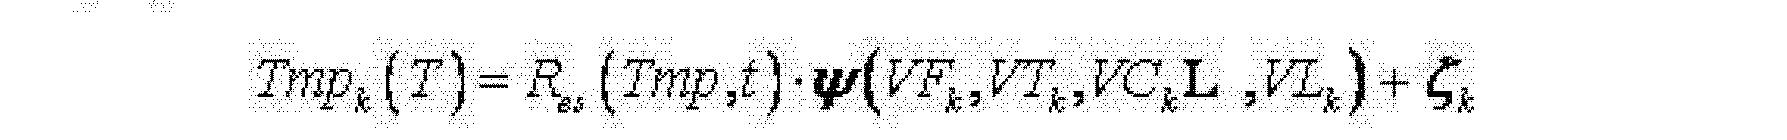 Figure CN102842097AD00201